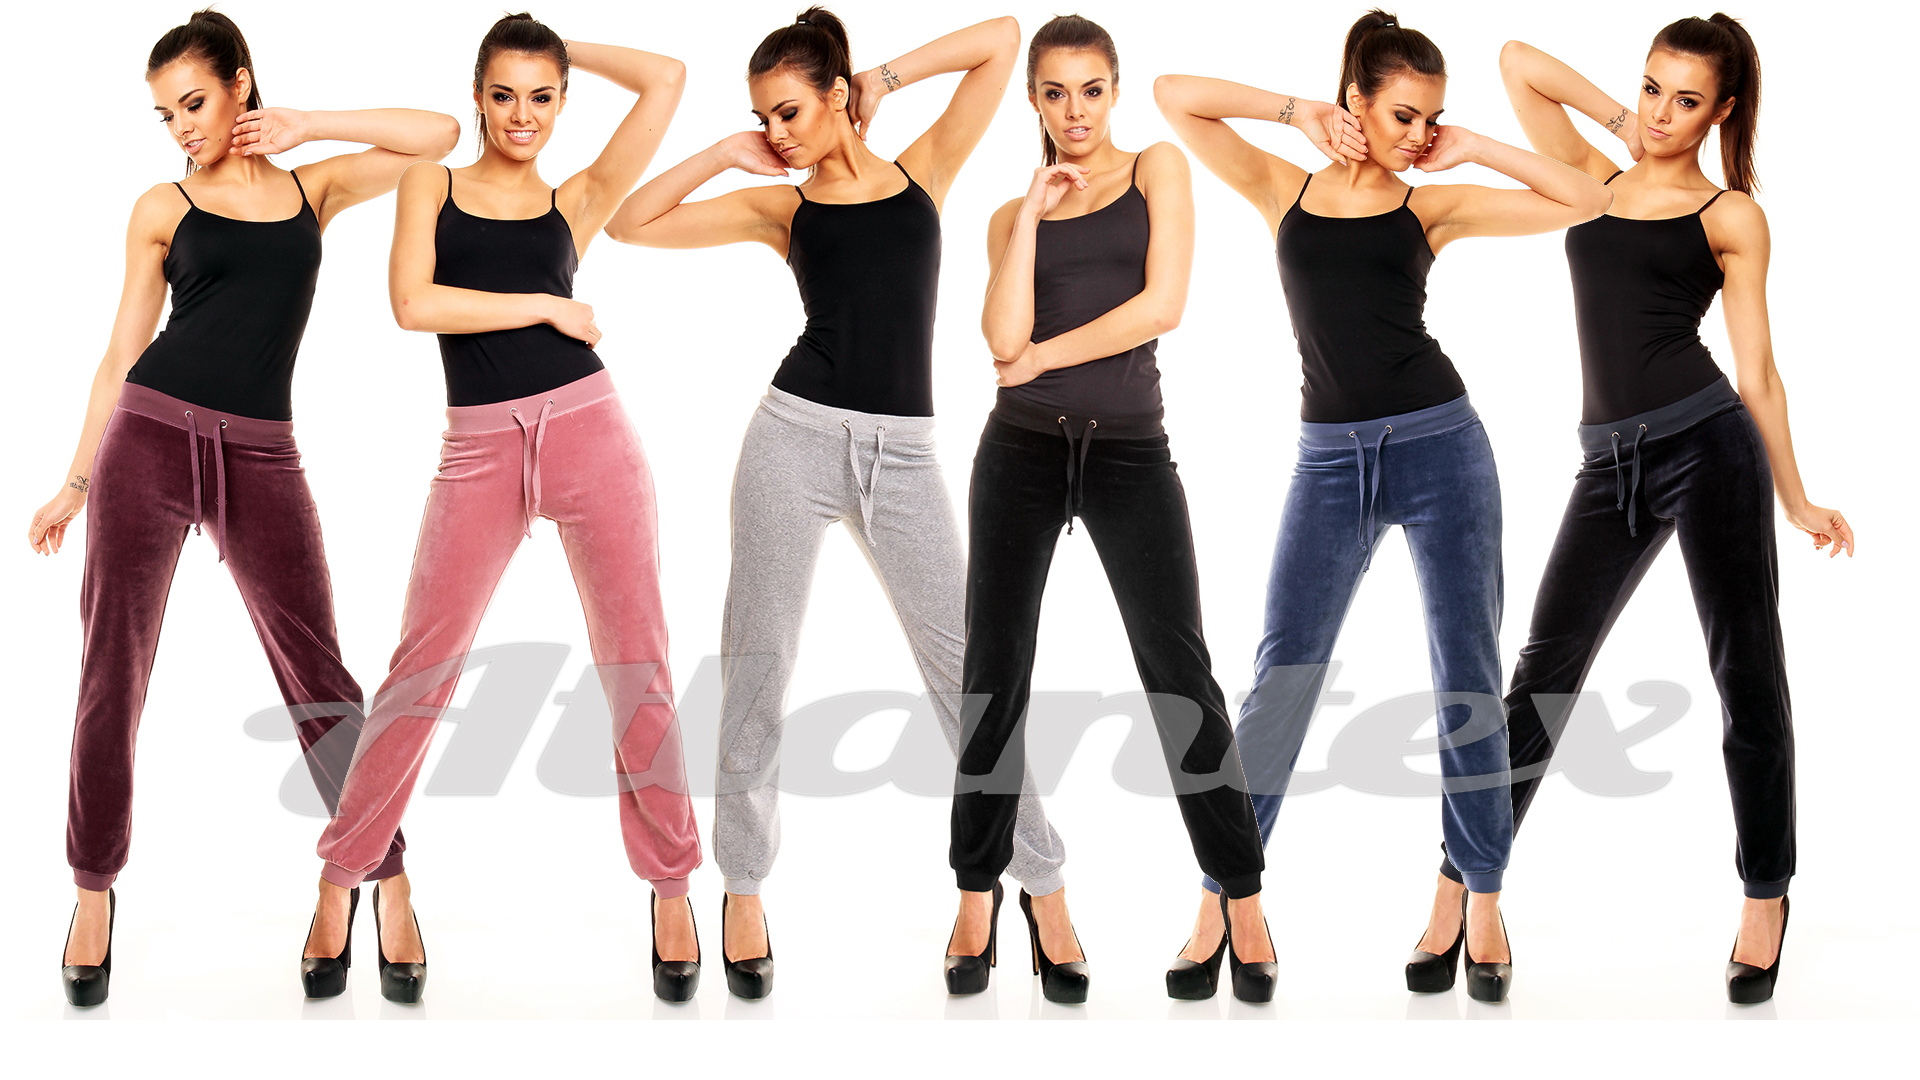 Spodnie dresowe, dresy - Atlantex.com.pl